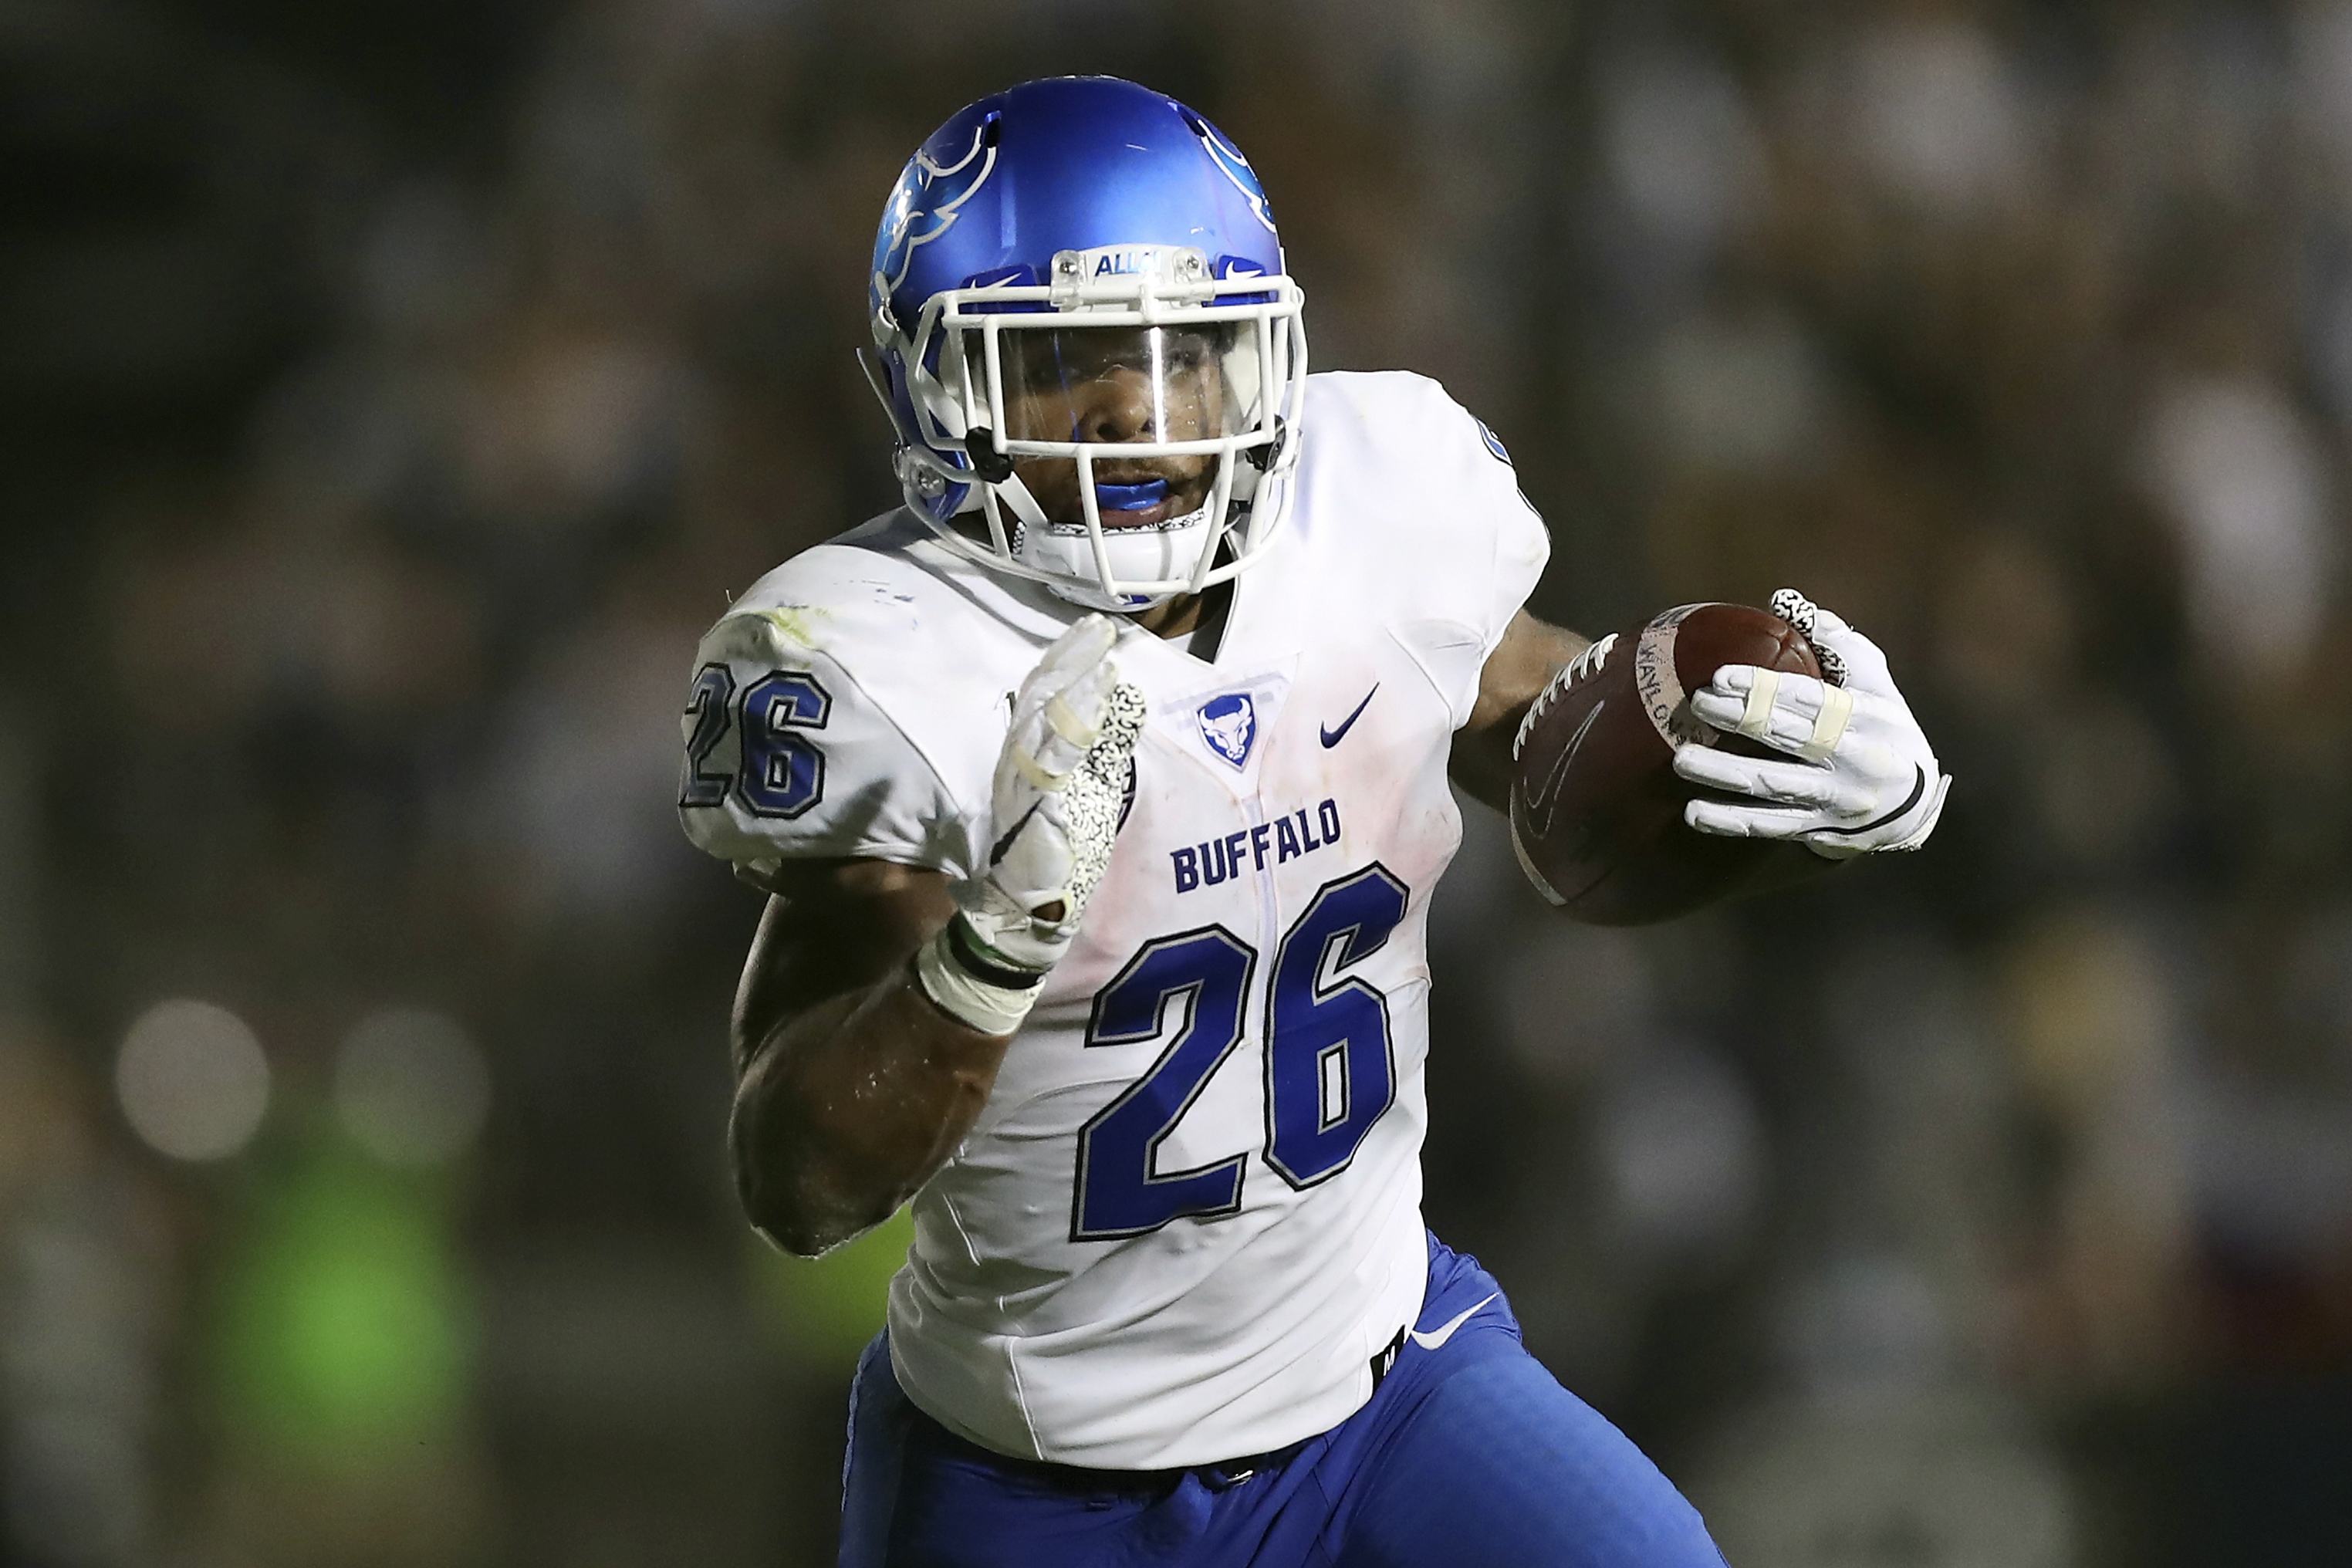 Patterson rushes Buffalo's expectations and Bahamas Bowl